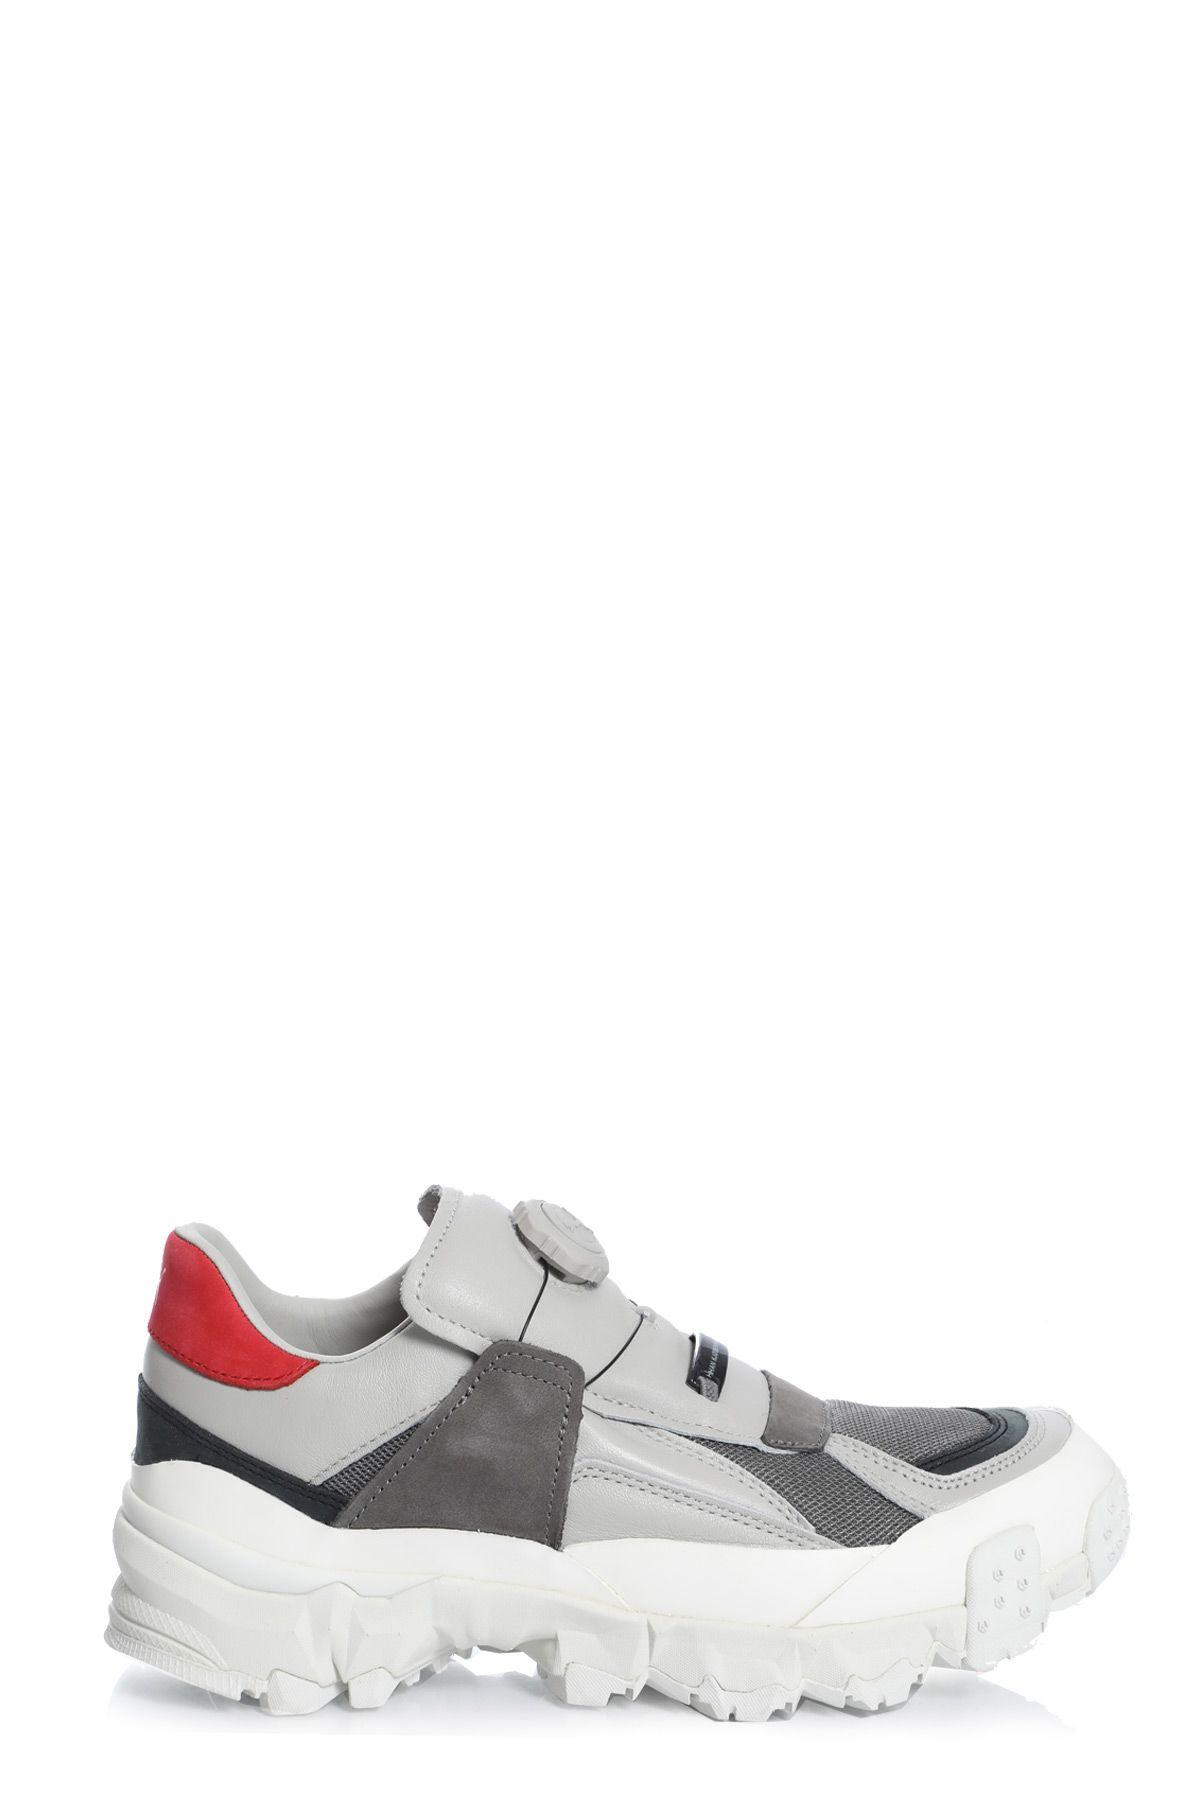 Puma X Han Kjobenhavn Sneakers